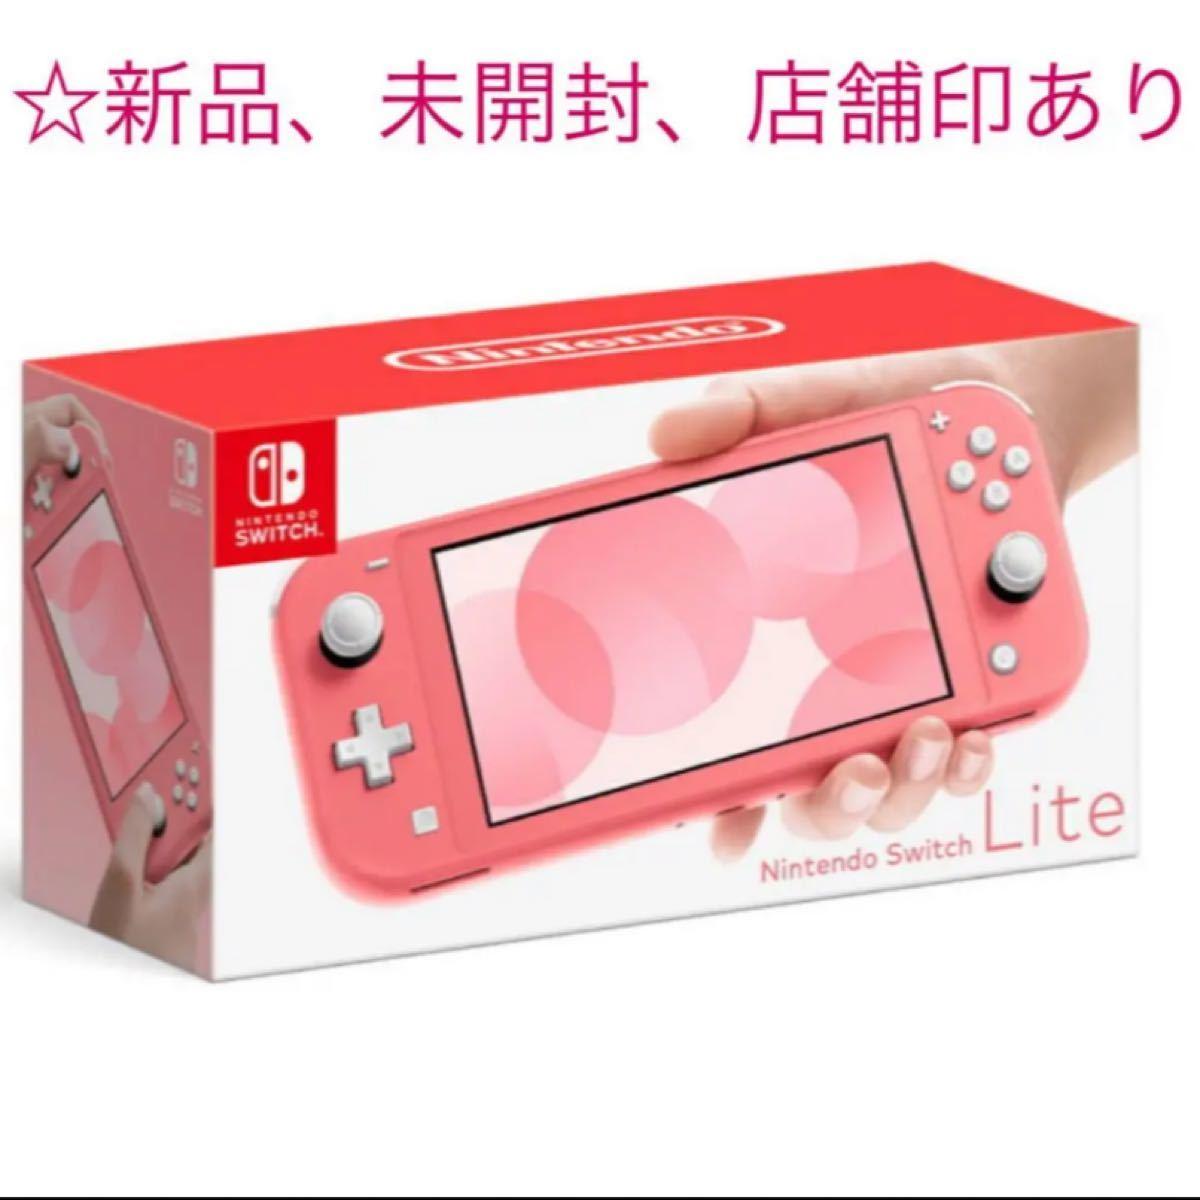 Nintendo Switch スイッチ ライト コーラル ピンク 本体 新品